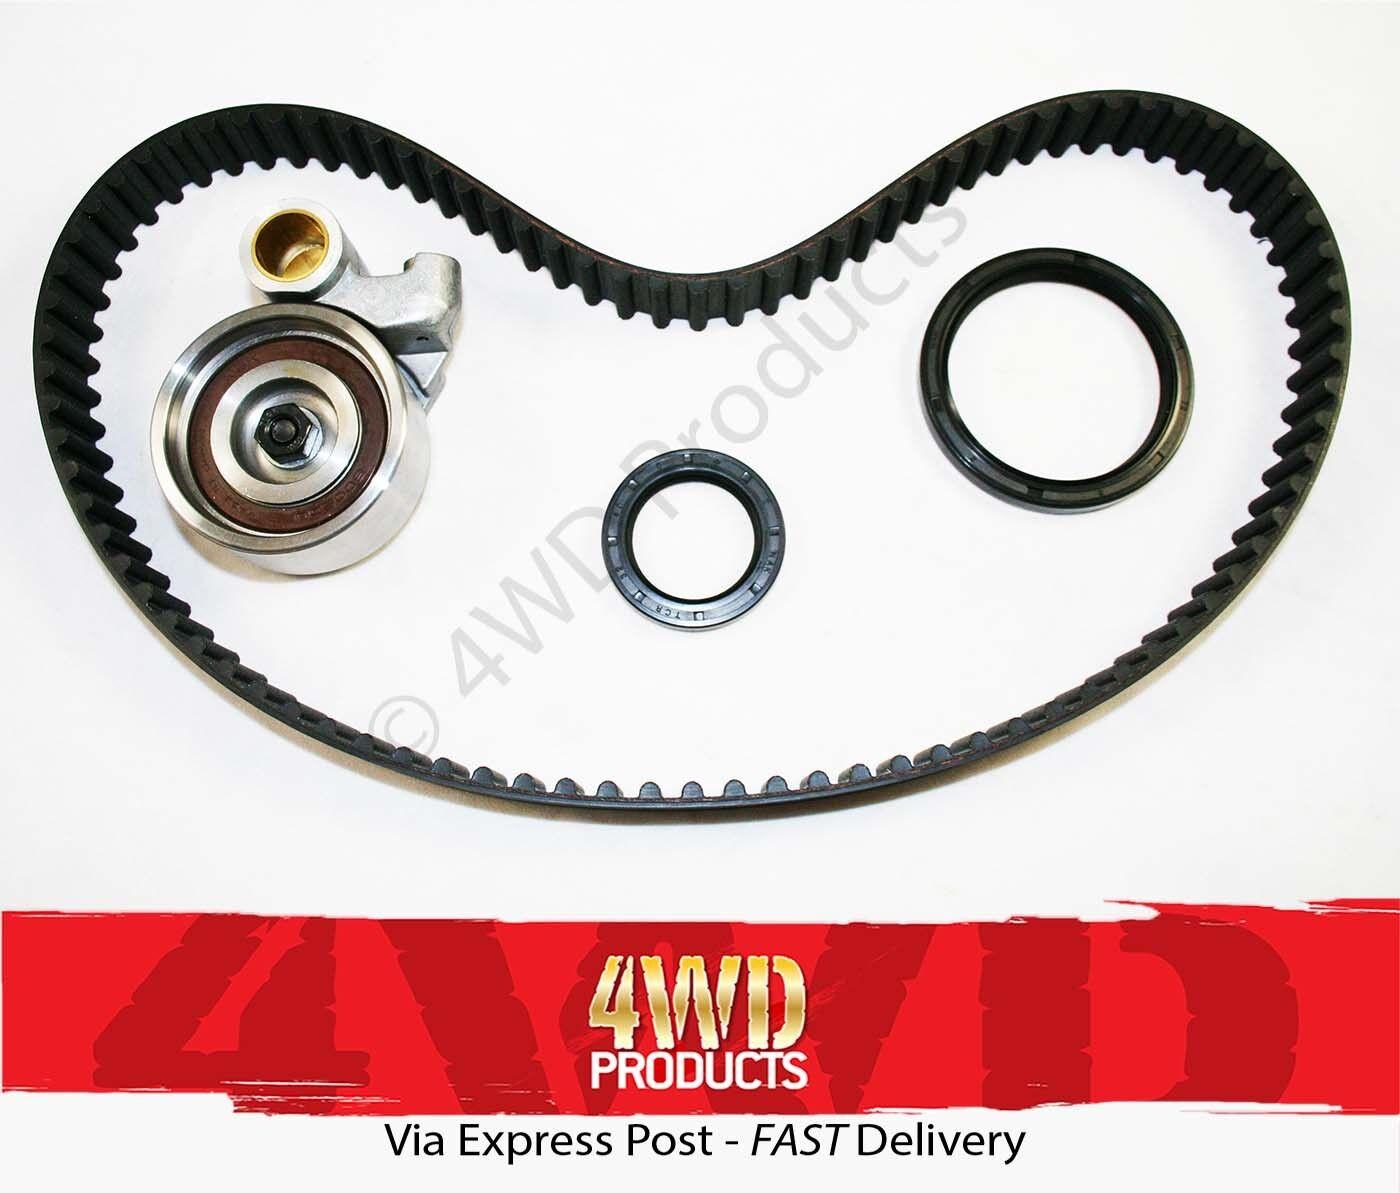 Details about Timing Belt kit - Toyota LandCruiser HZJ75 HZJ78 HZJ79 HZJ105  4 2D 1HZ (98-06)